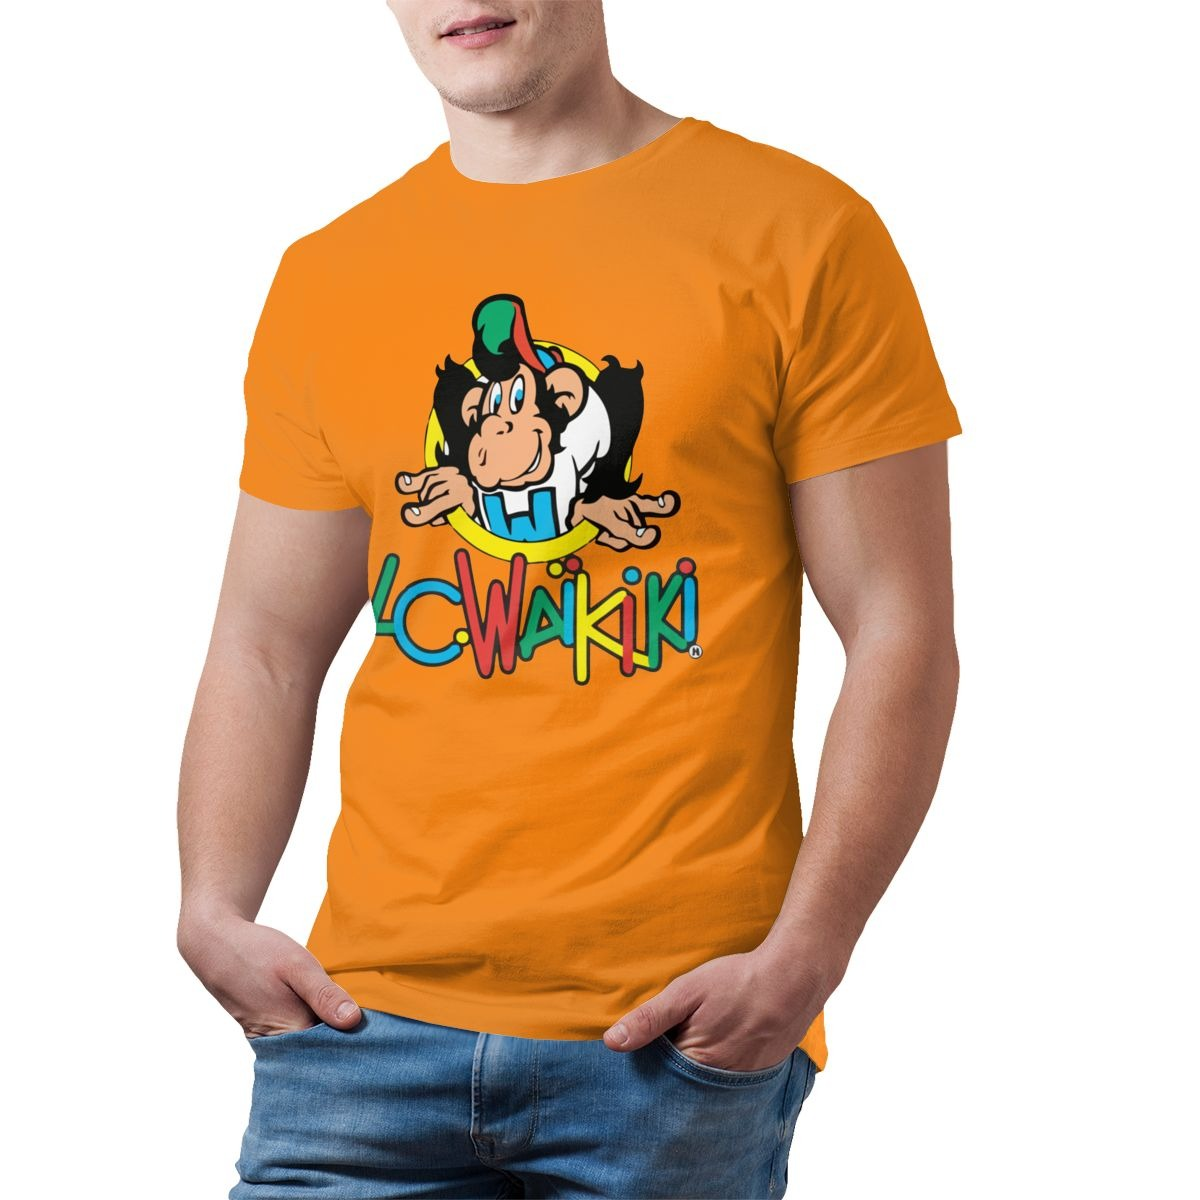 top monkey t shirt lc waikiki monkey merchandise t shirt graphic cotton tee shirt mens short sleeves beach tshirt print casual 7758 - PewDiePie Merch